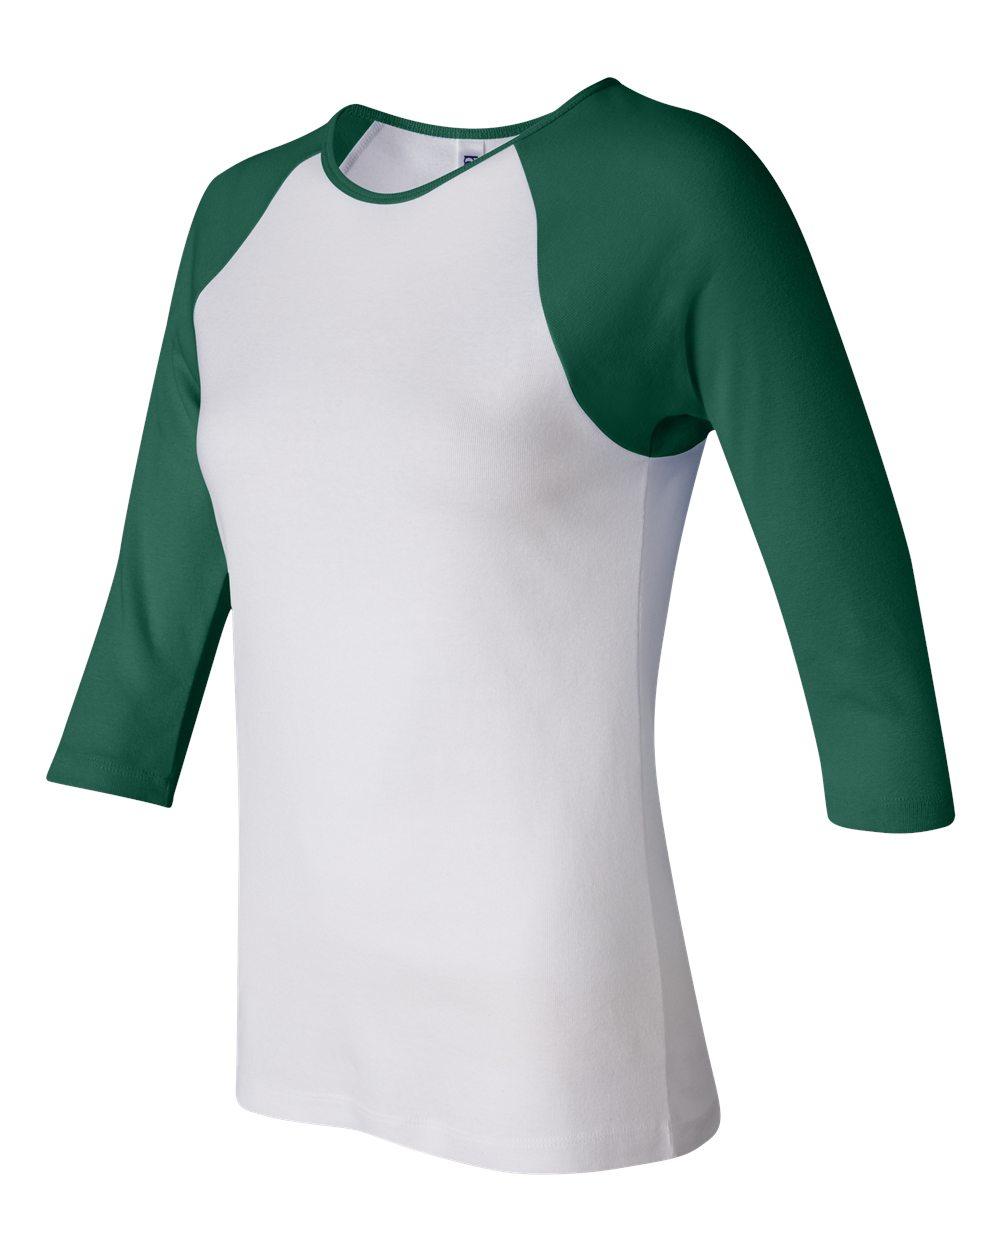 Bella-Canvas-Womens-Stretch-Rib-3-4-Sleeve-Contrast-Raglan-T-Shirt-B2000 thumbnail 16